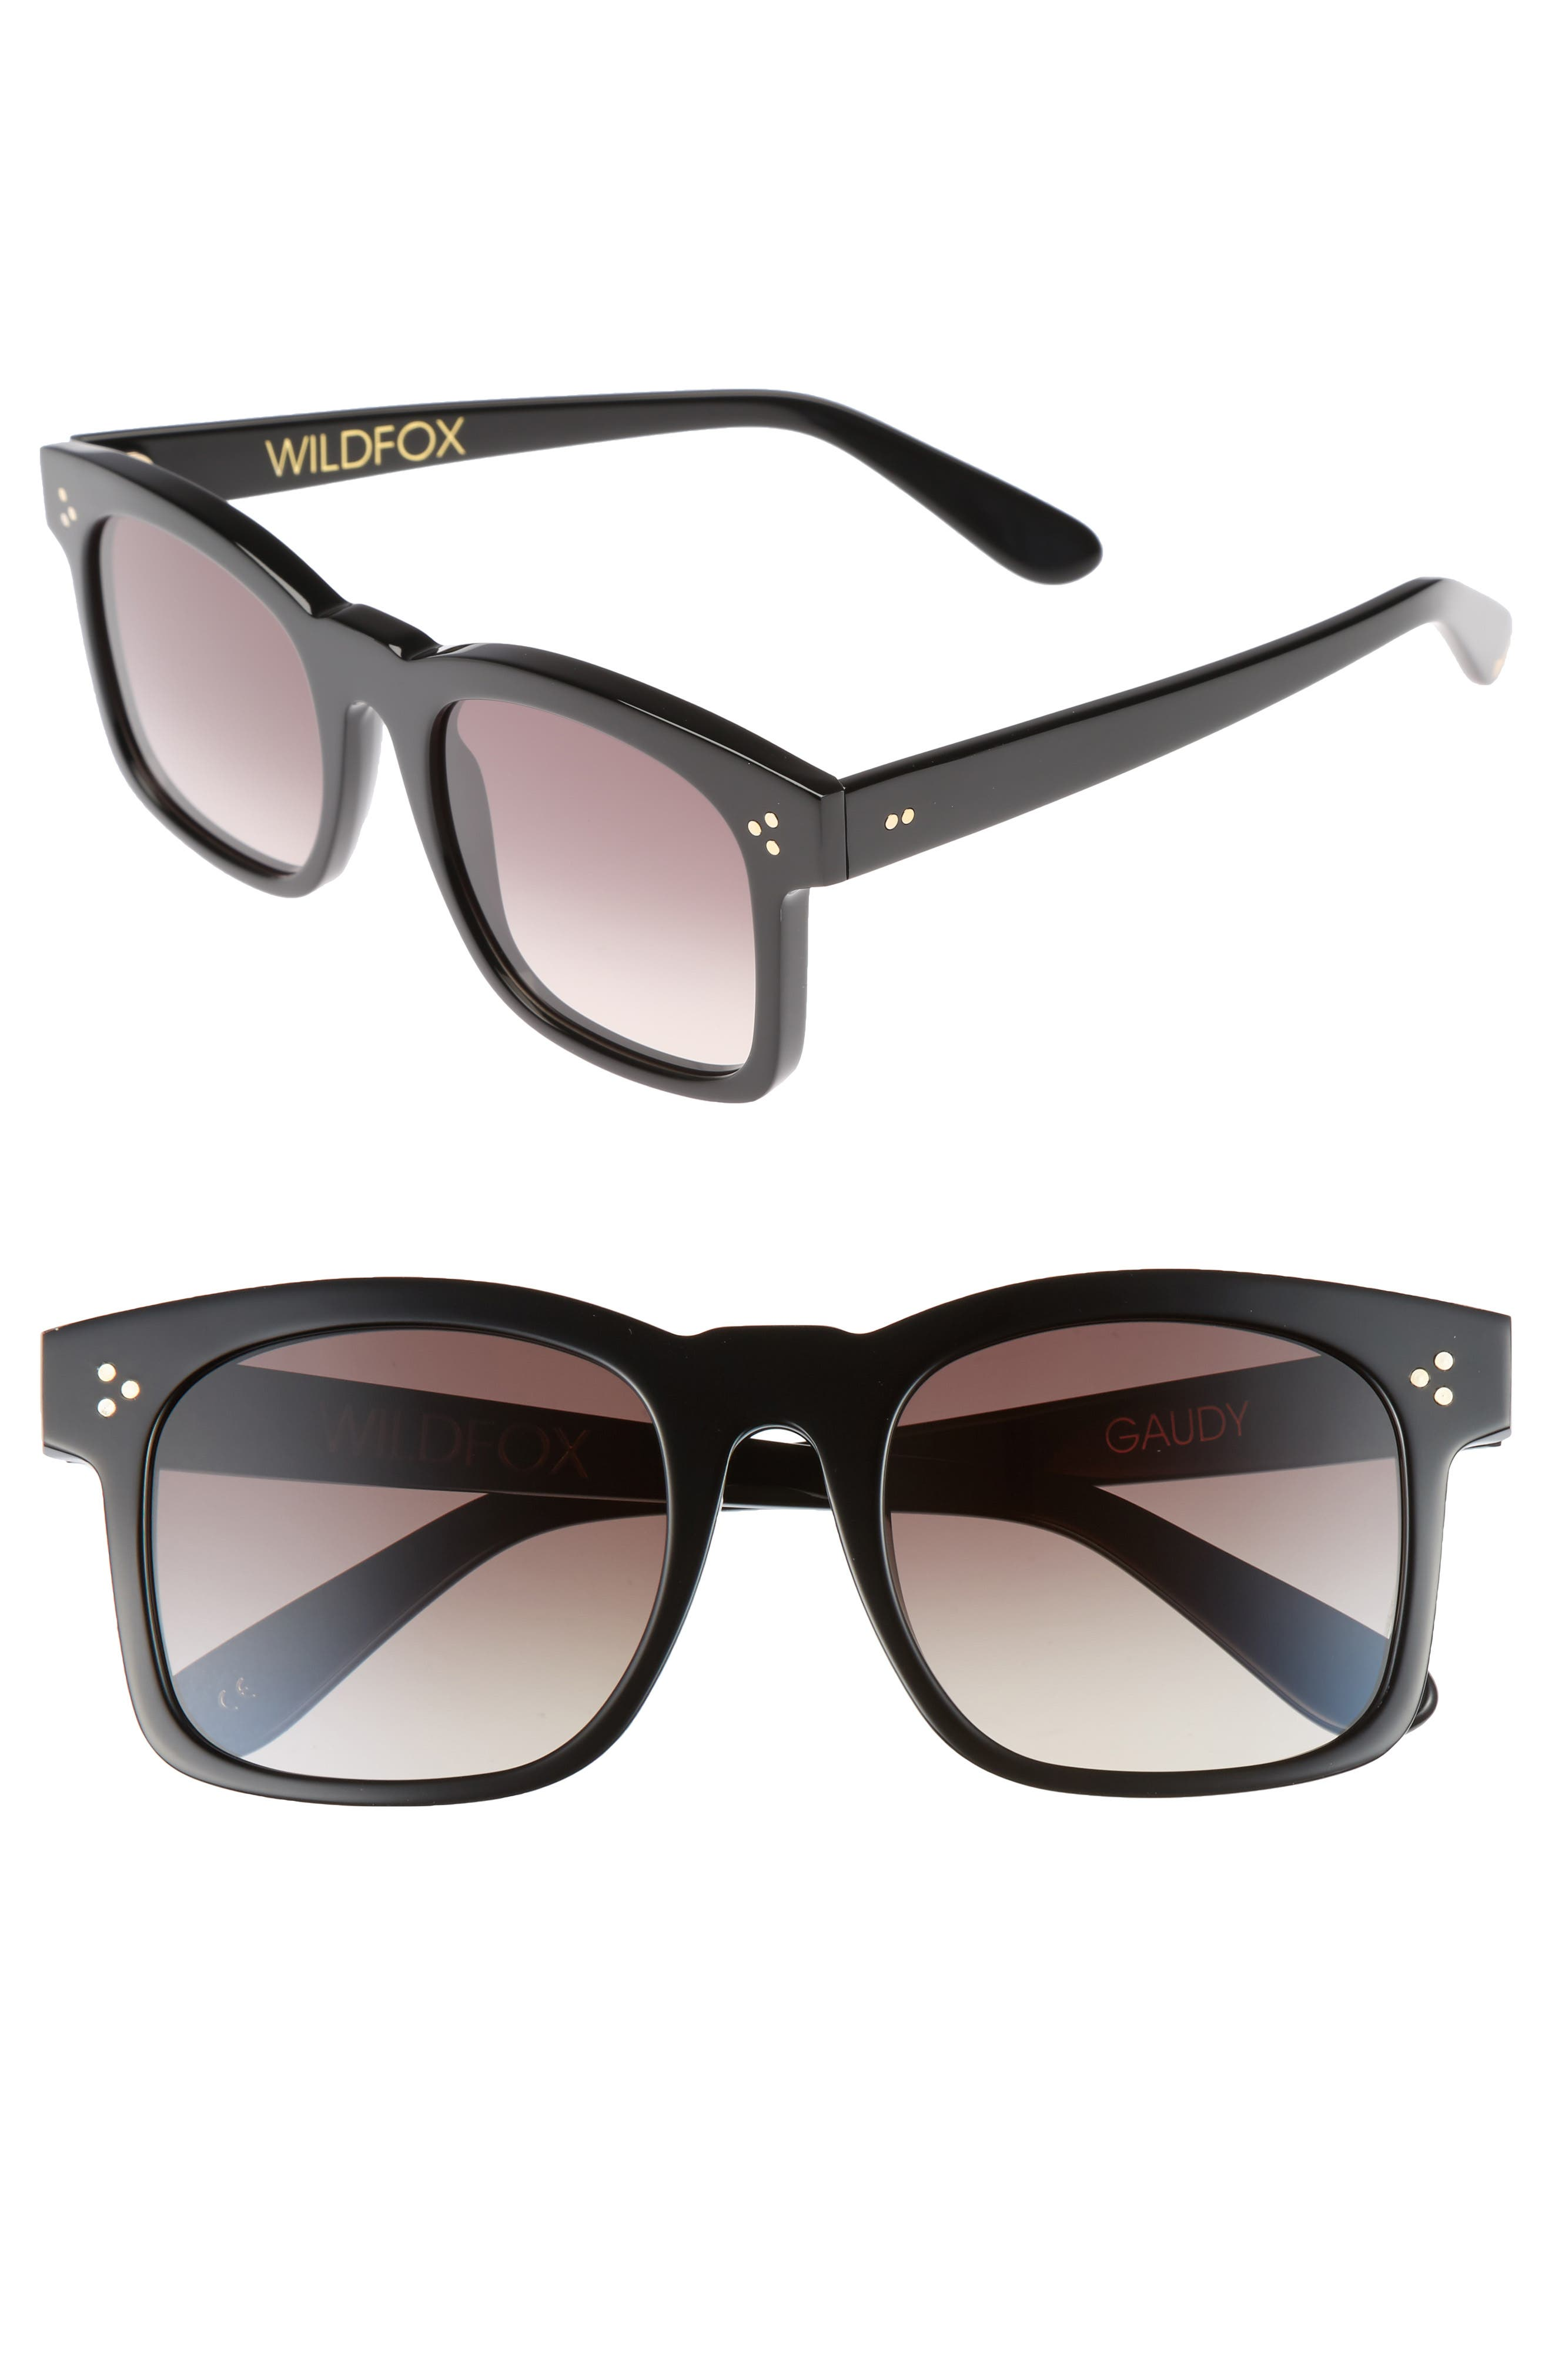 Gaudy Zero 51mm Flat Square Sunglasses,                             Main thumbnail 1, color,                             Black